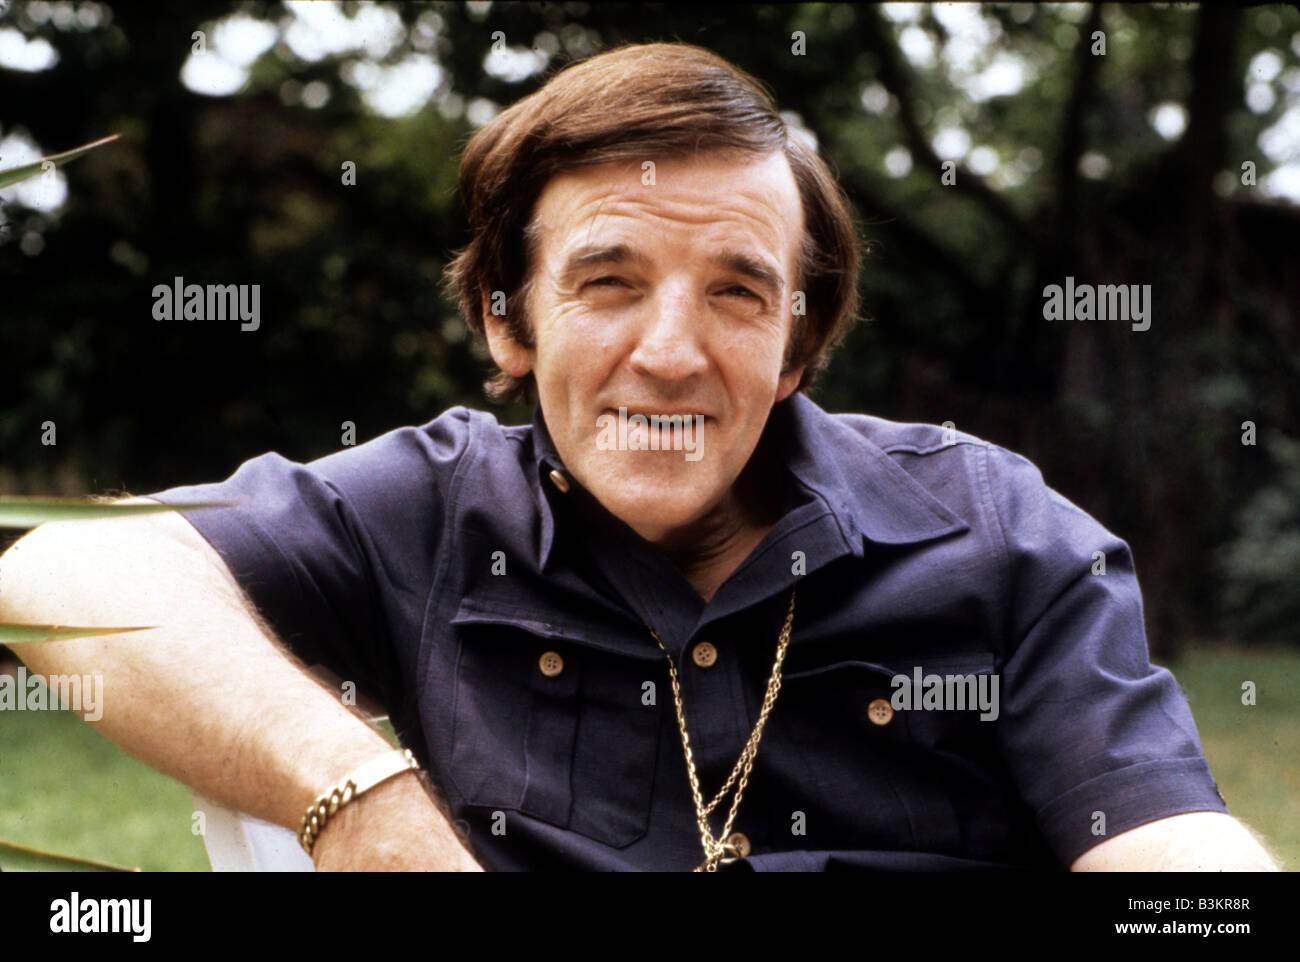 ALAN FREEMAN UK radio and TV presenter about 1978 - Stock Image